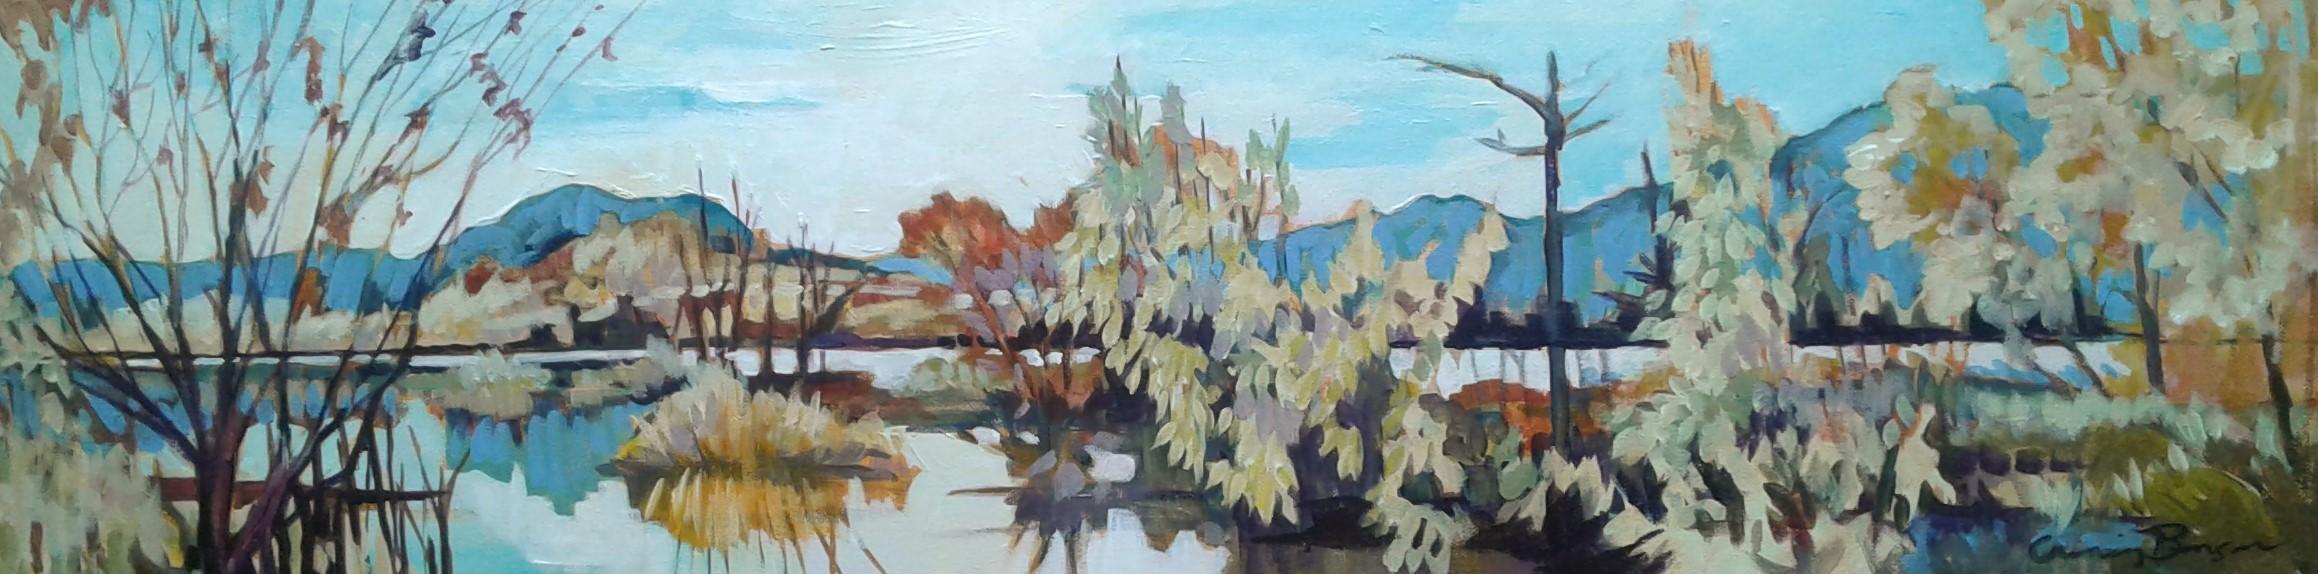 Kelowna Wetlands 8x30 $450